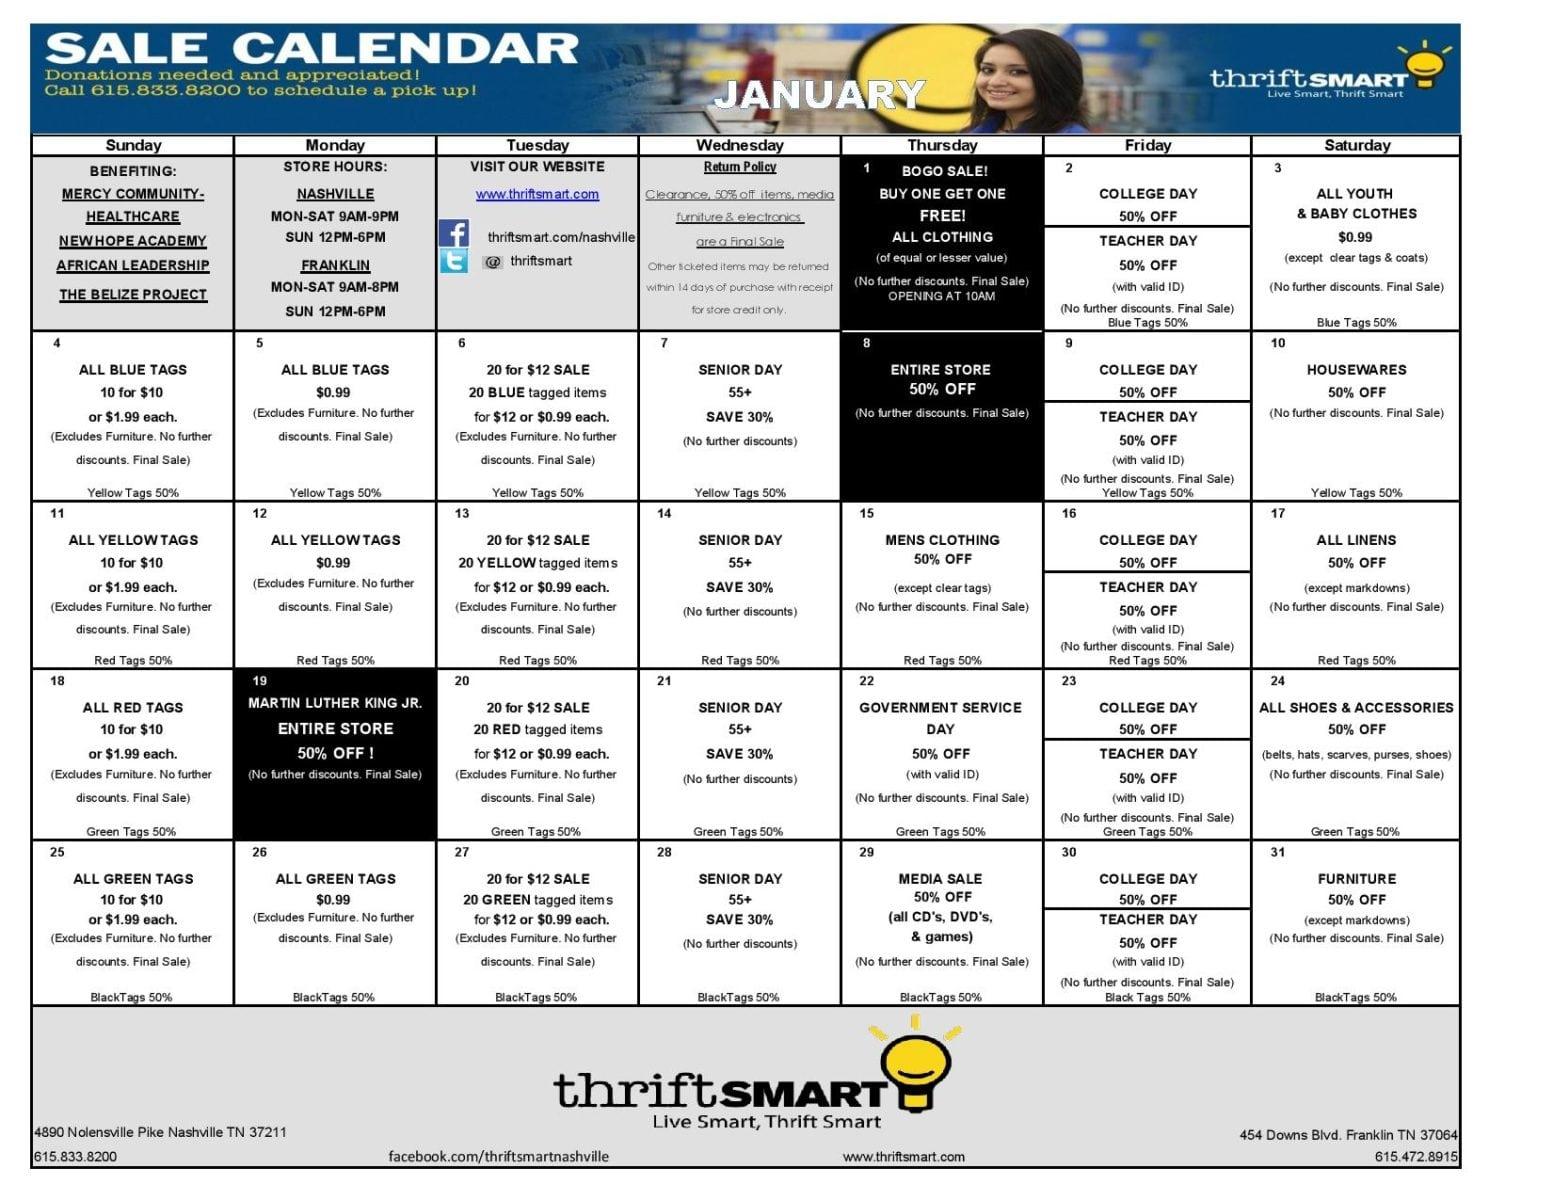 Calendar For Sale : January sale calendar thriftsmart